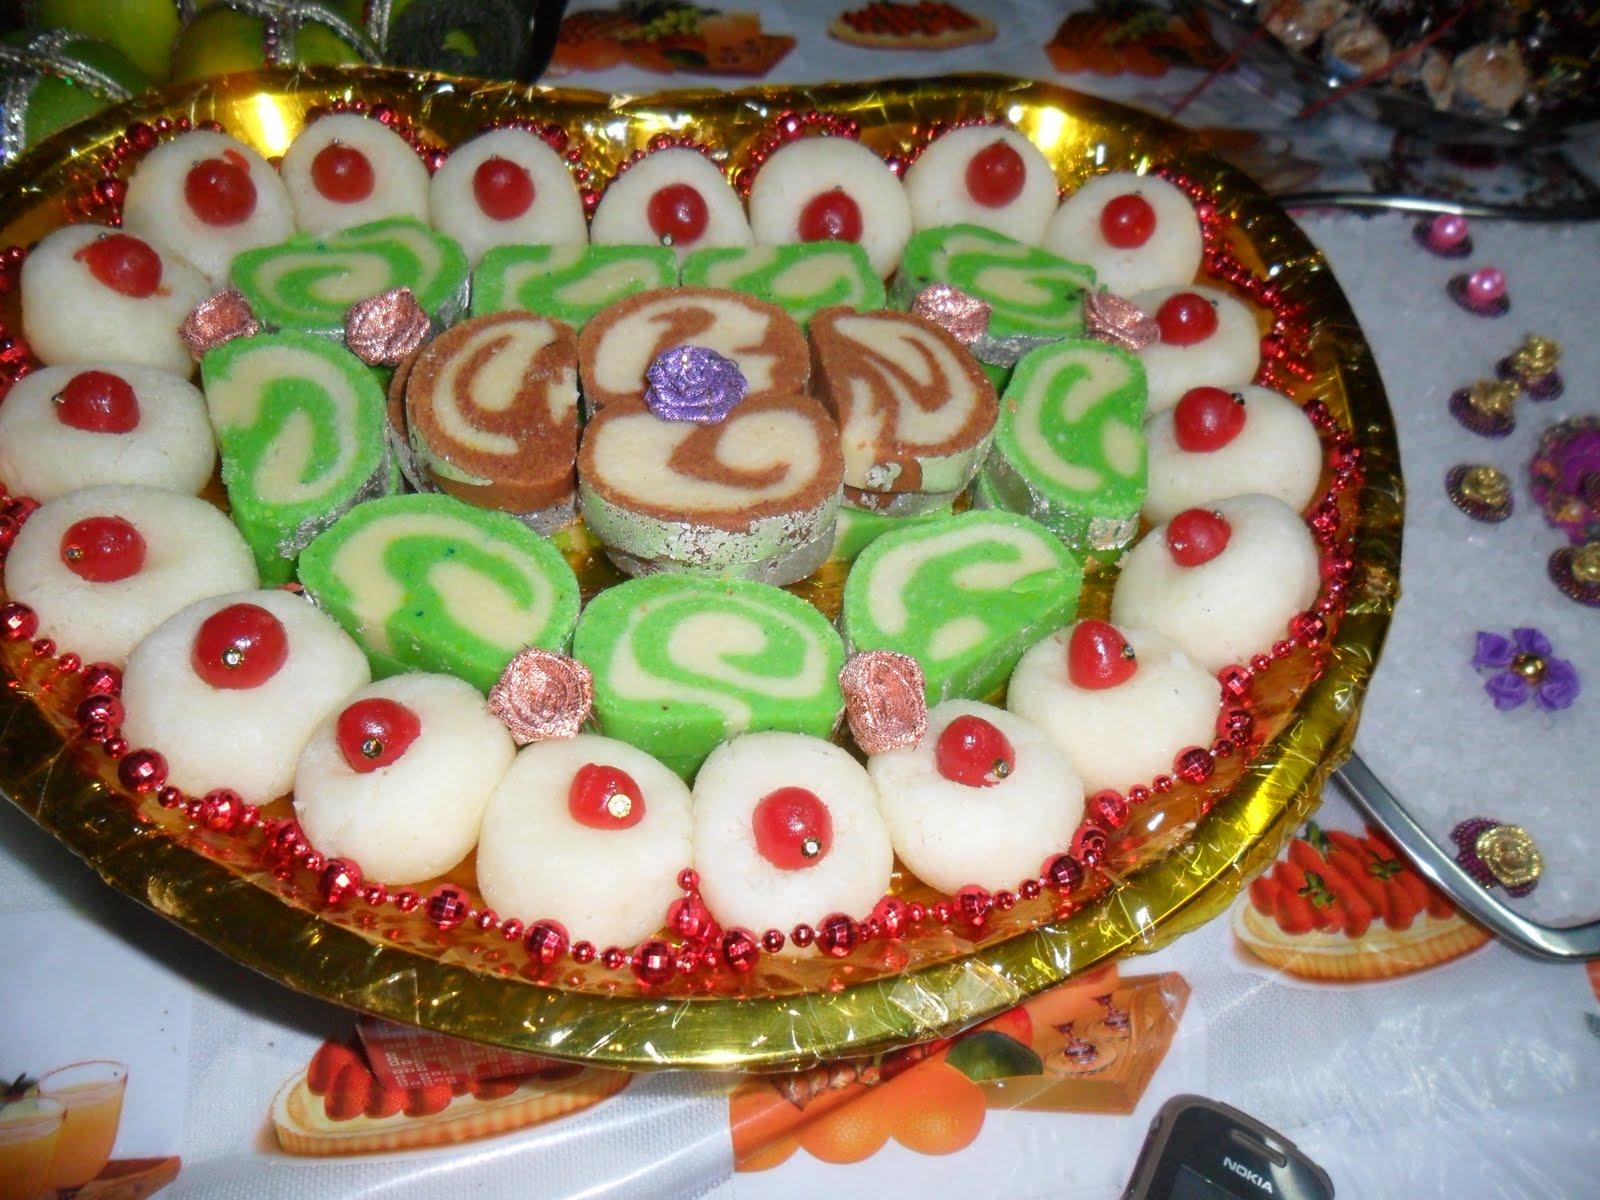 & Engagement Plate Decorations